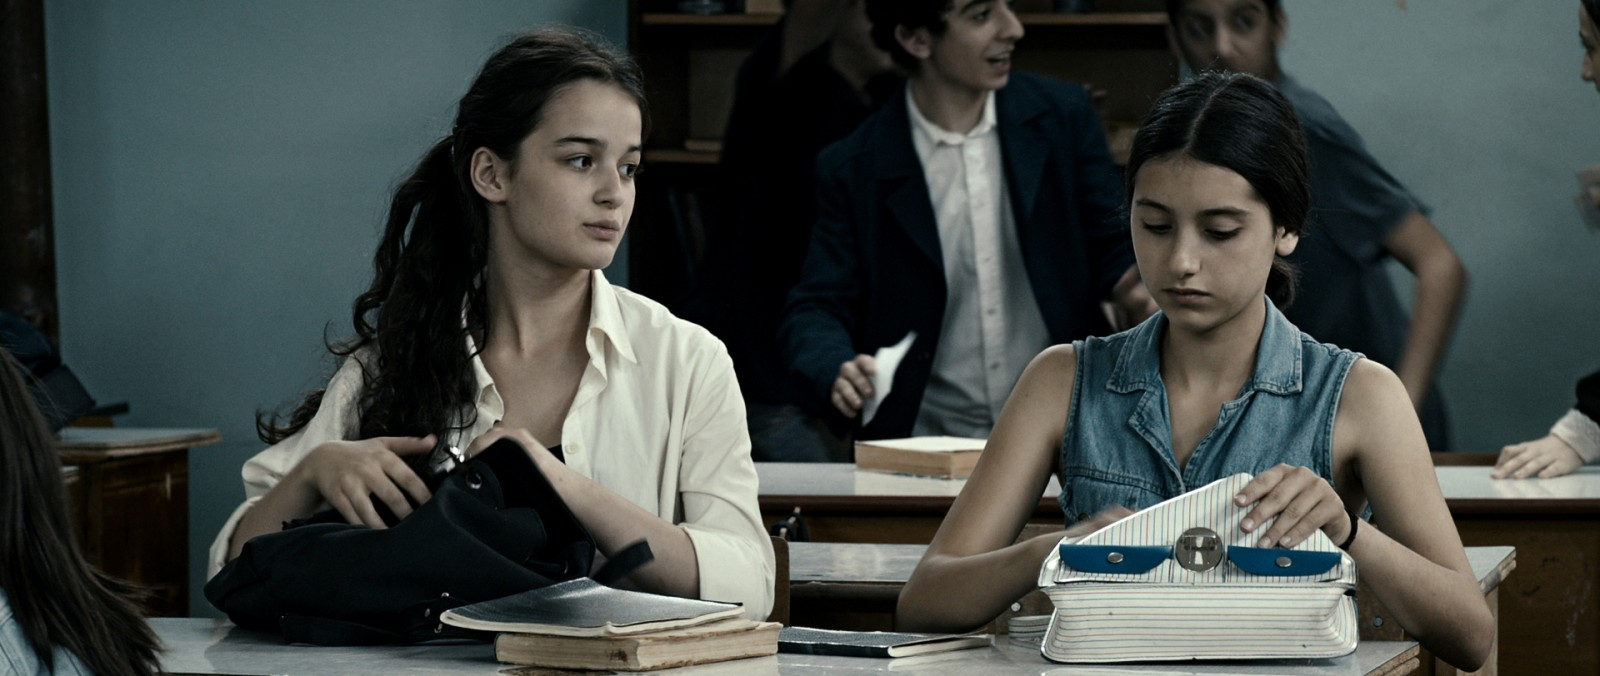 """Eka et Natia, Chronique d'une jeunesse géorgienne"" de Nana Ekvtimishvili & Simon Groß (Géorgie)"